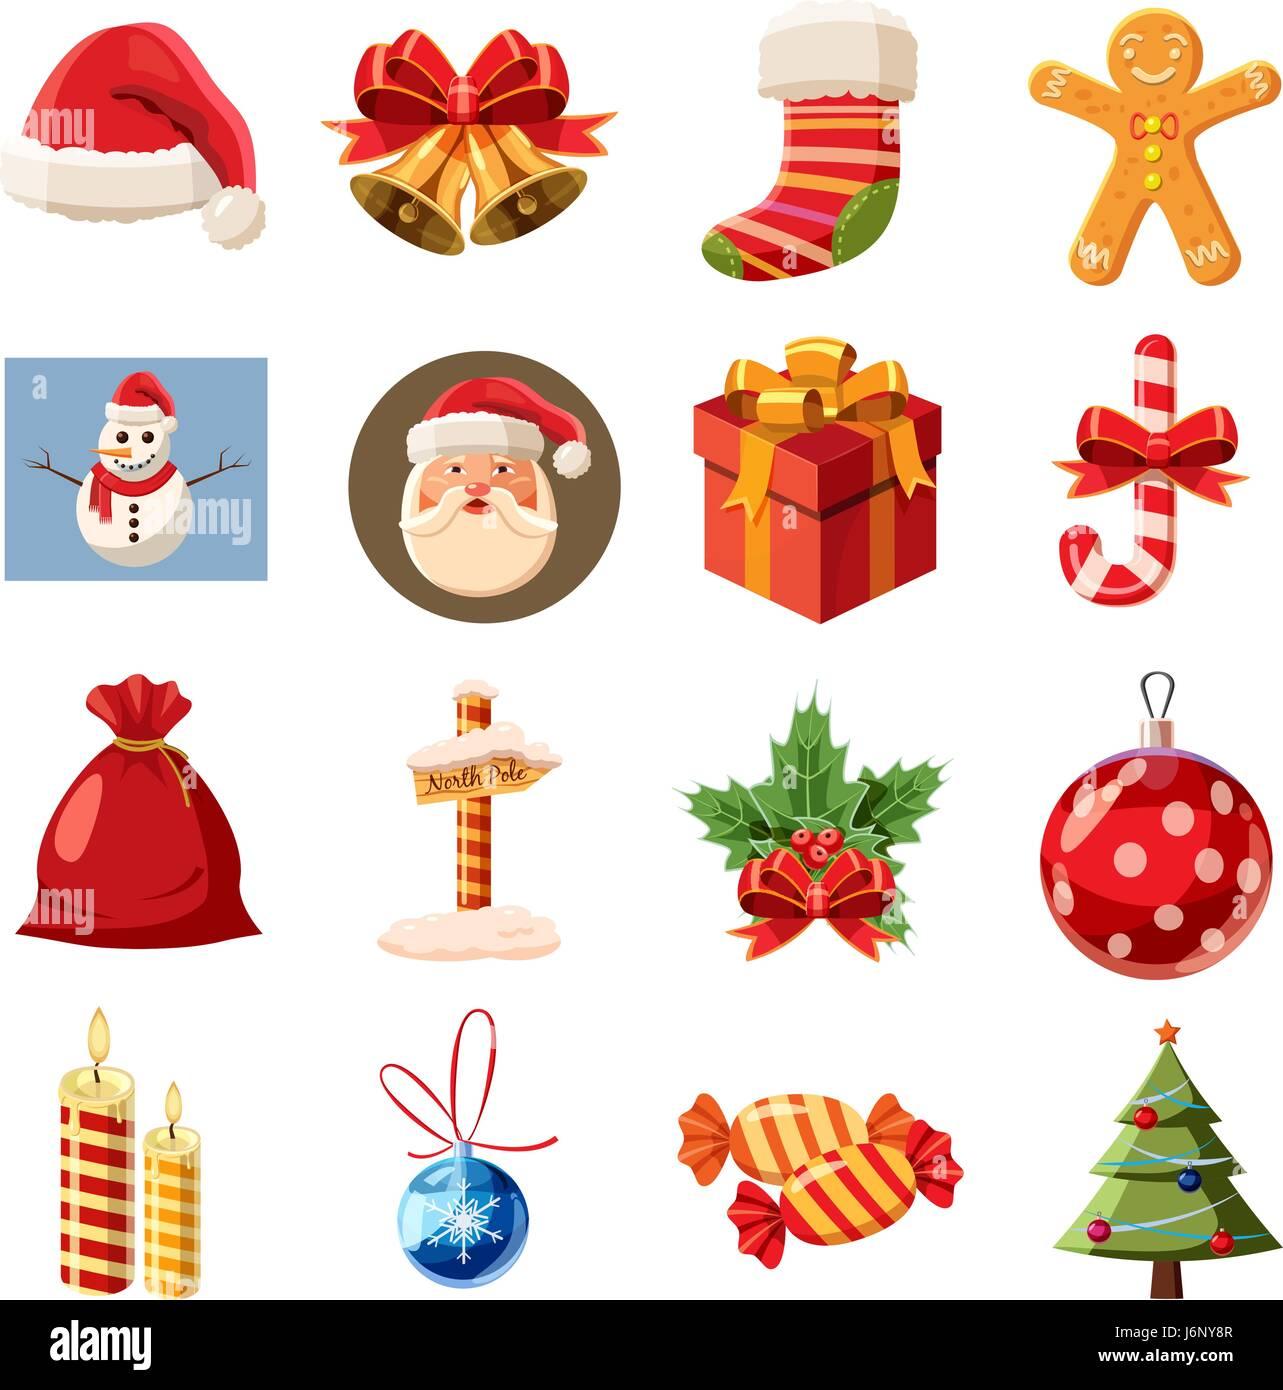 Christmas icons set, isometric 3d style - Stock Image